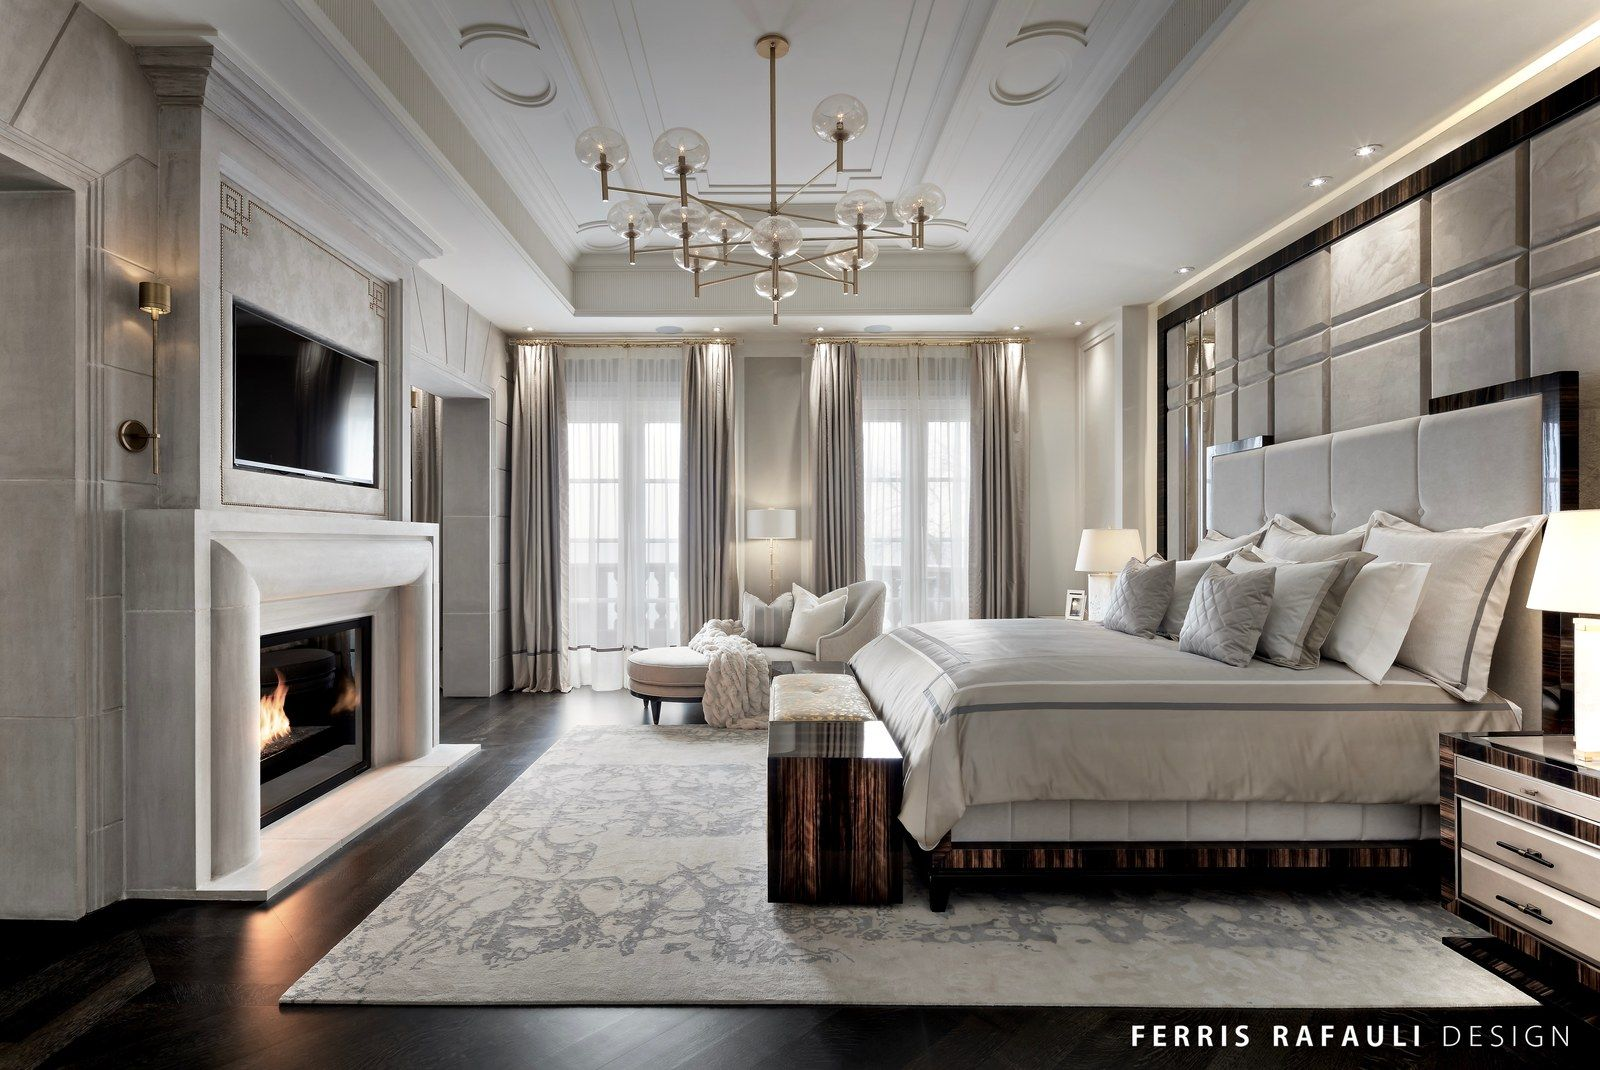 Ferris Rafauli | Architecture by Ferris Rafauli | Luxurious ...